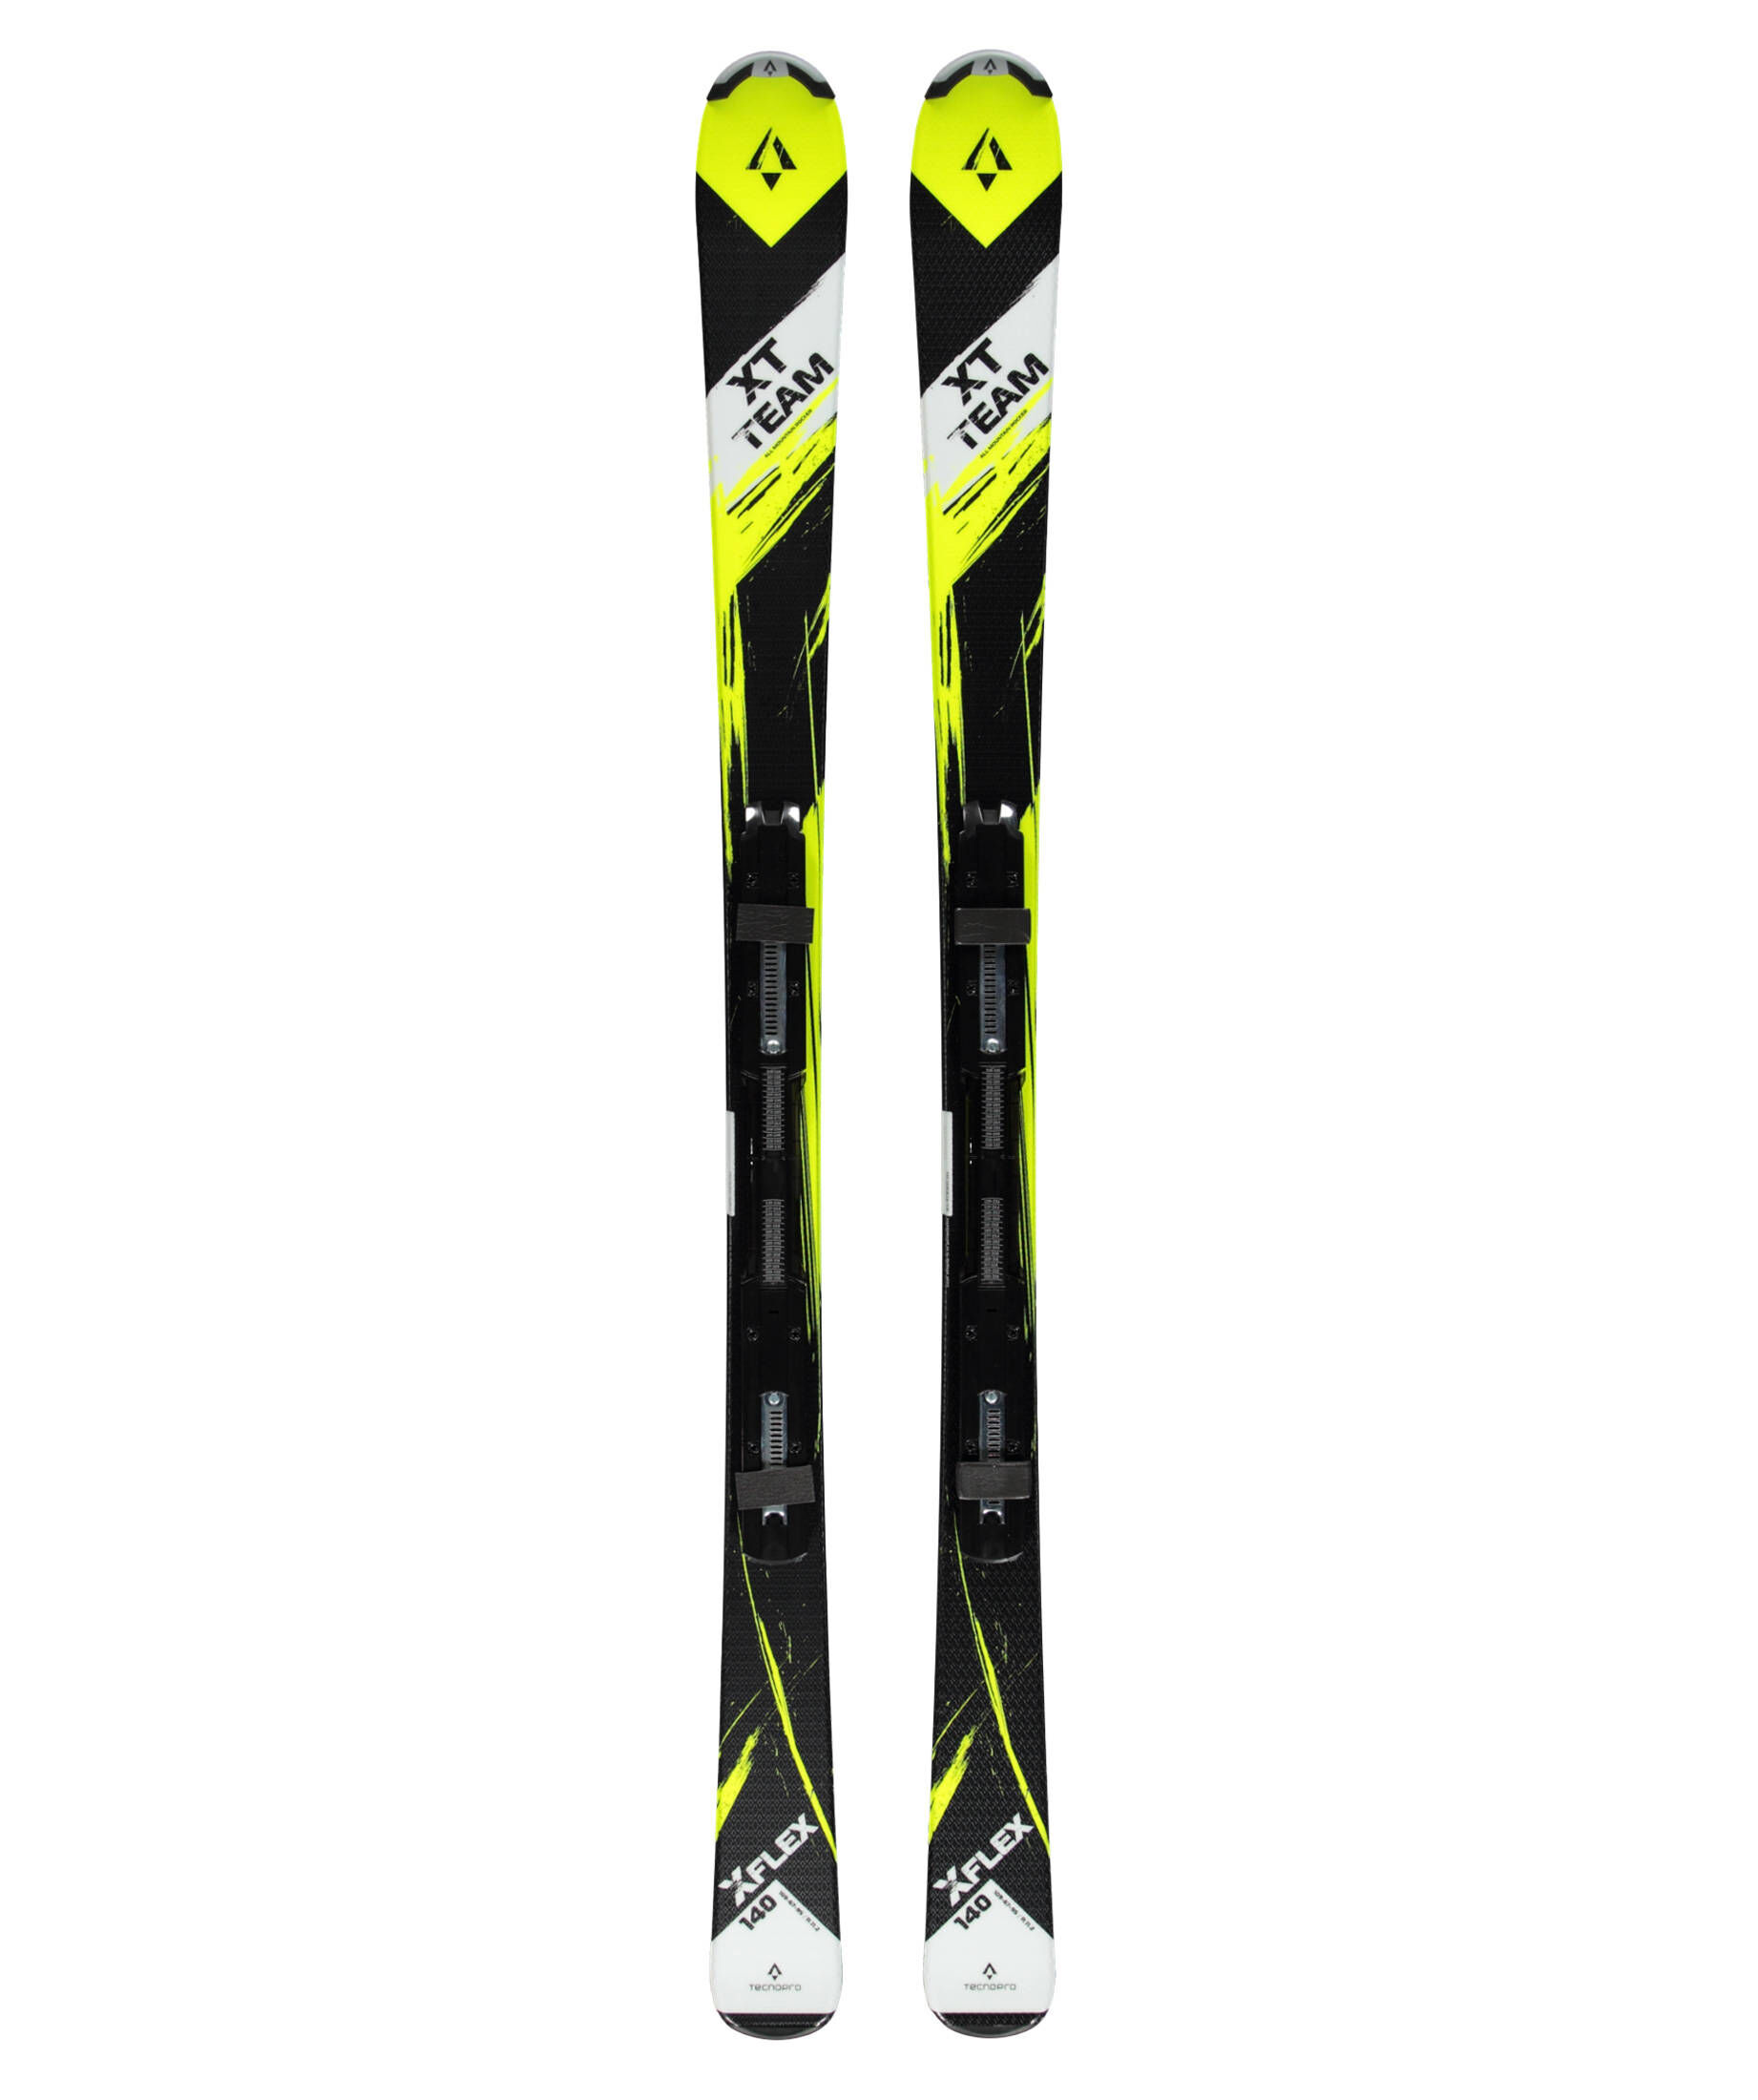 Alpin Tecnopro Ski Alpin Bindung  E TL 75 B80  weiß/schwarz